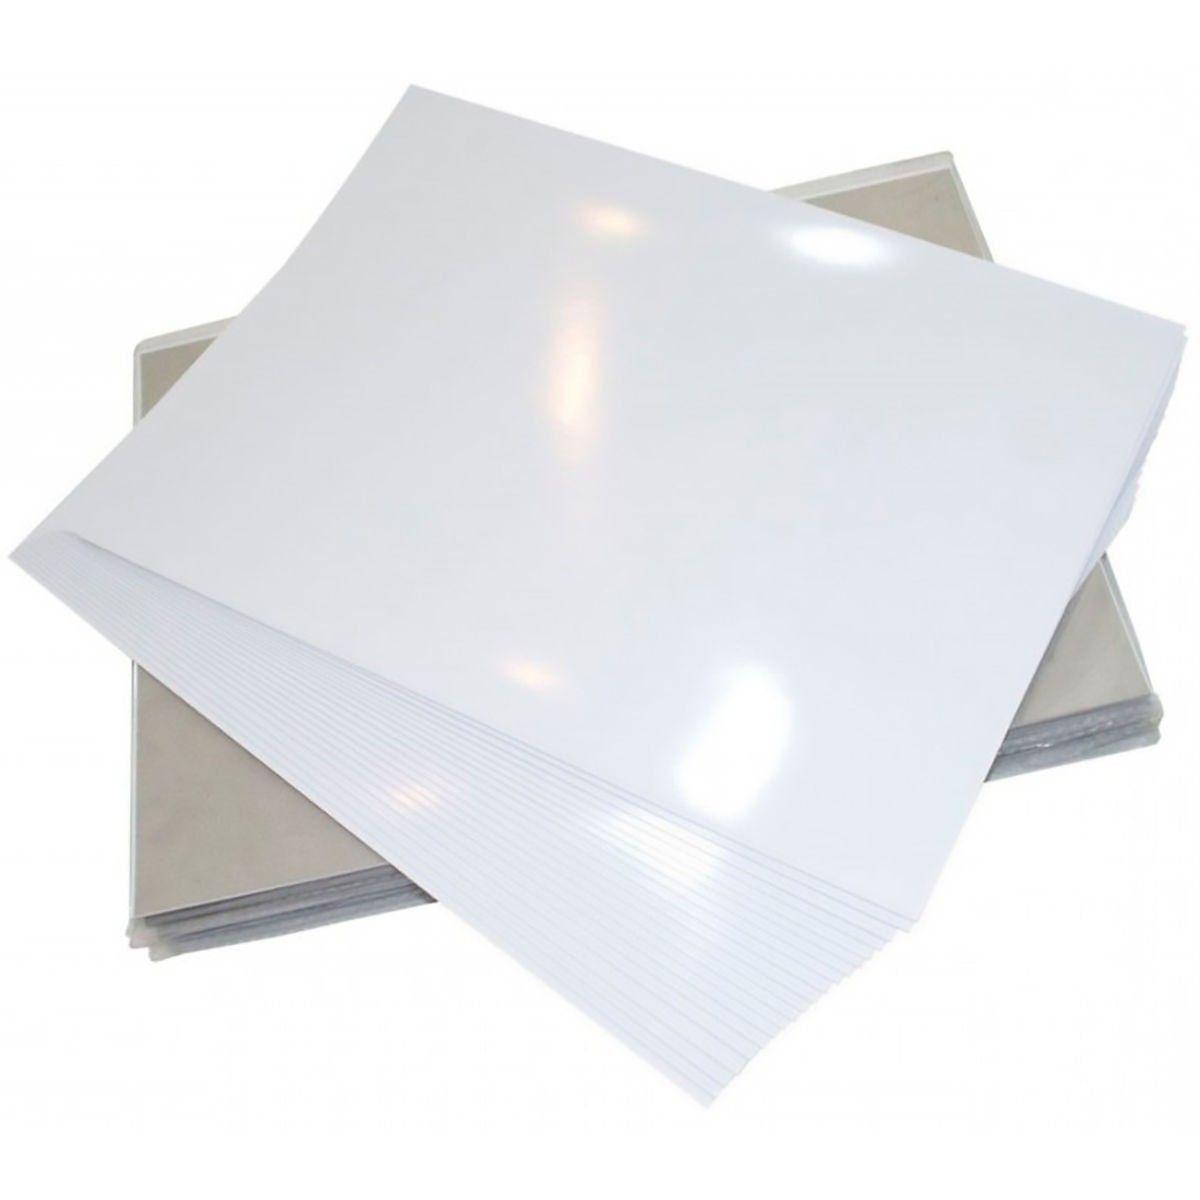 Papel Fotográfico A4 Dupla Face 180g Glossy Branco Brilhante Resistente à Água / 1000 folhas